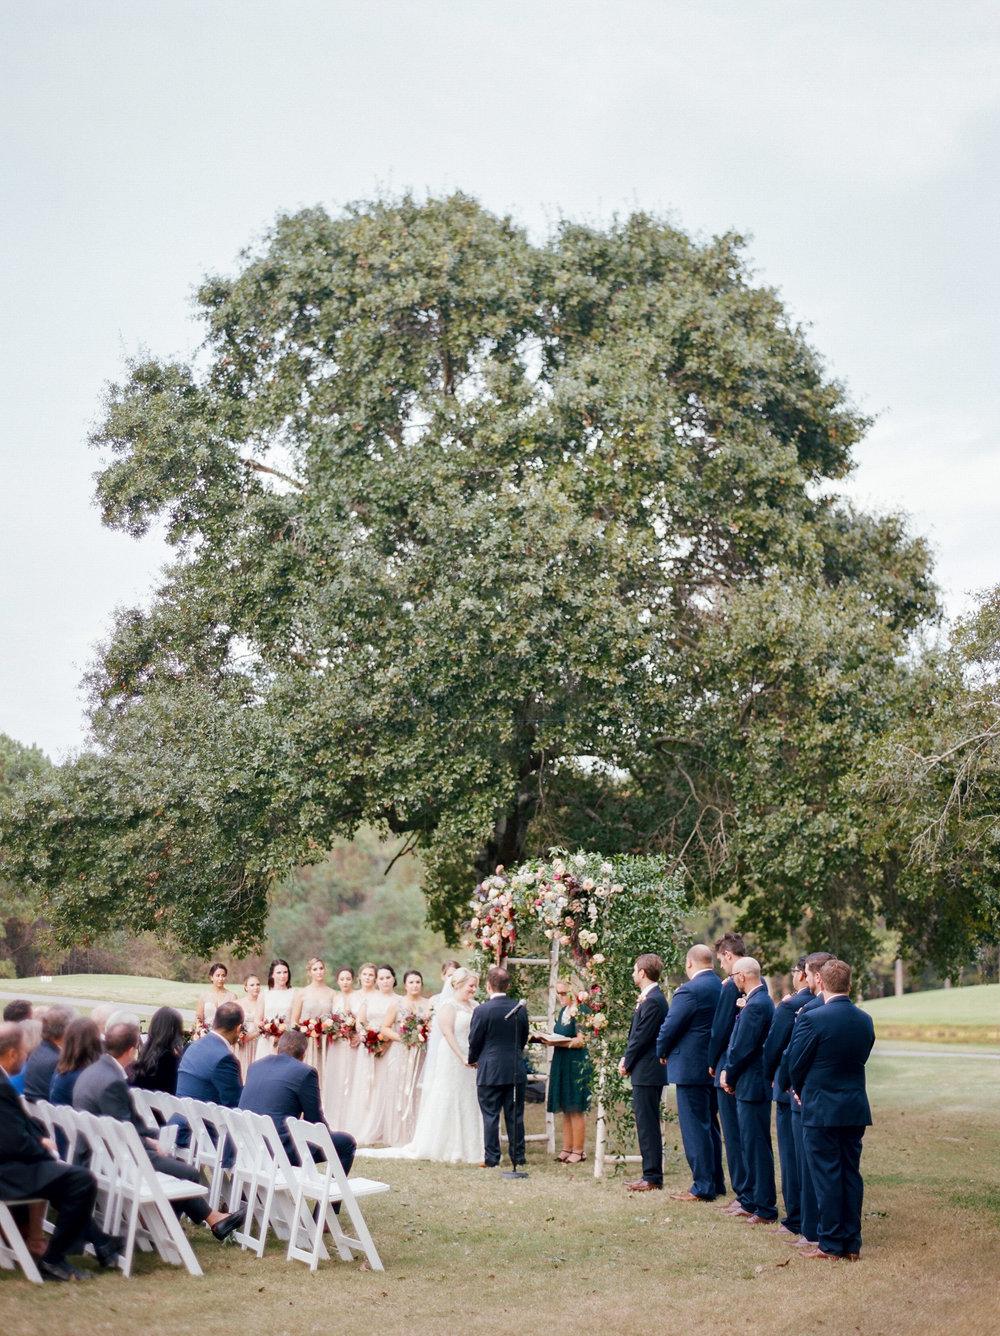 Houston-Wedding-Photographer-Fine-Art-Film-Destination-Style-Me-Pretty-Austin-Dallas-New-Orleans-Dana-Fernandez-Photography-The Woodlands-Country-Club-18.jpg